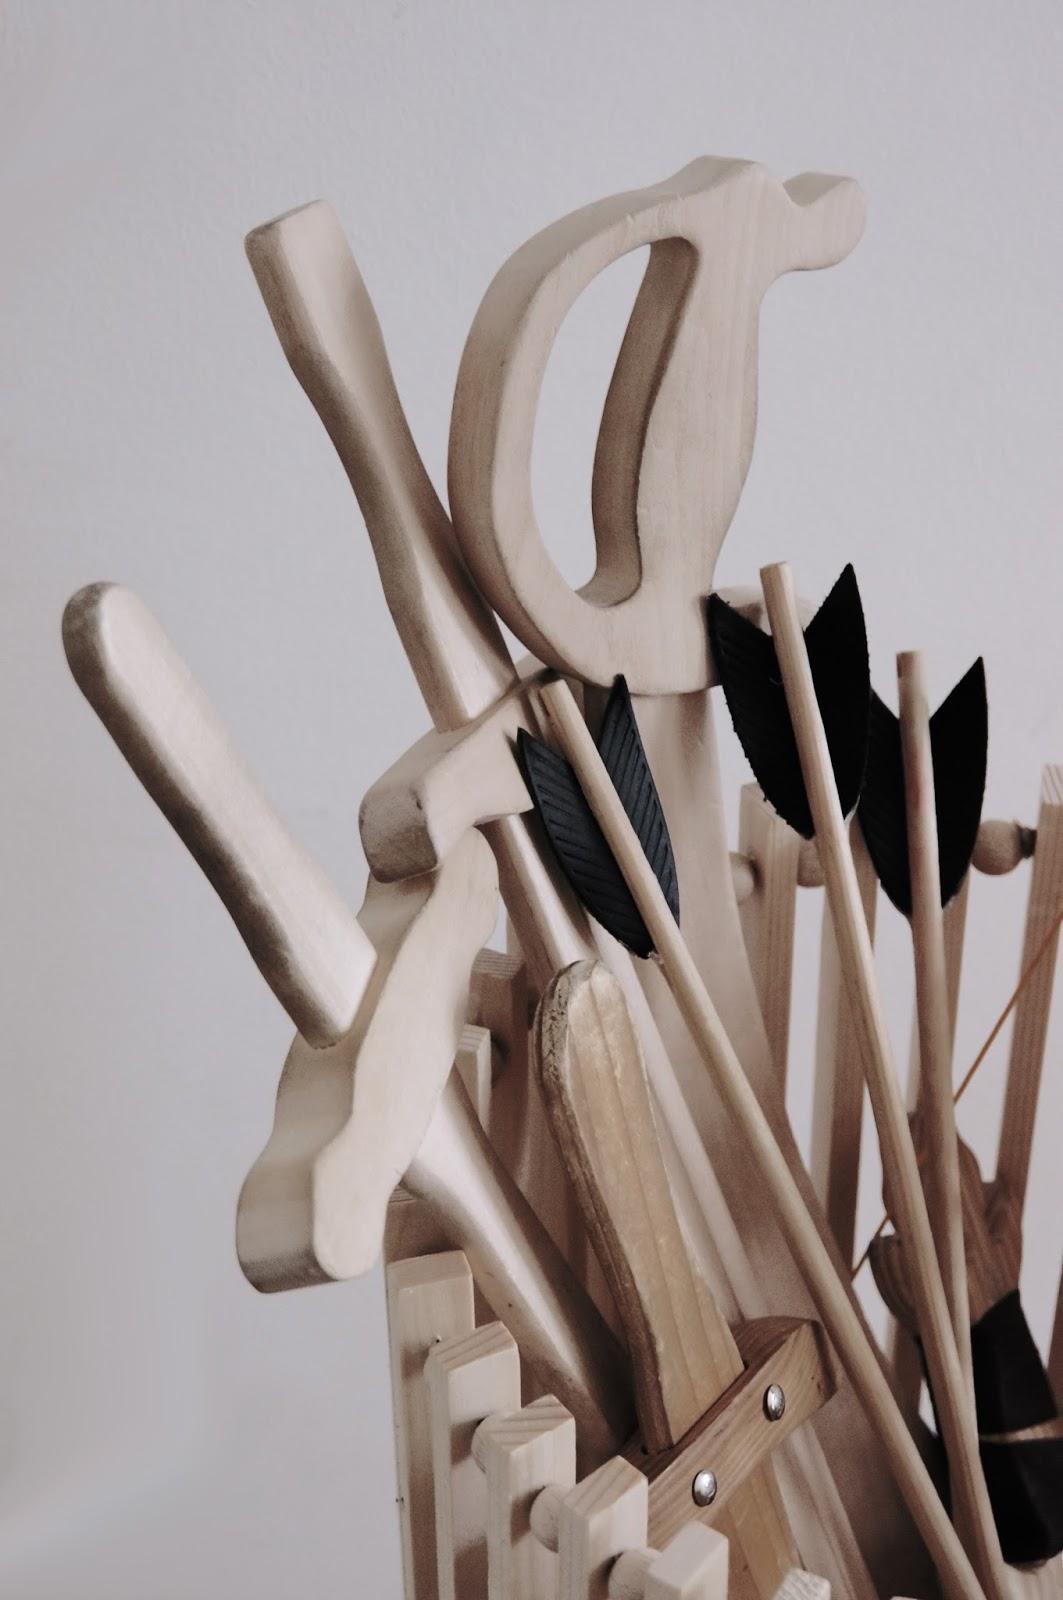 Basteln Malen Kuchen Backen: Körbe Aus Holzleisten